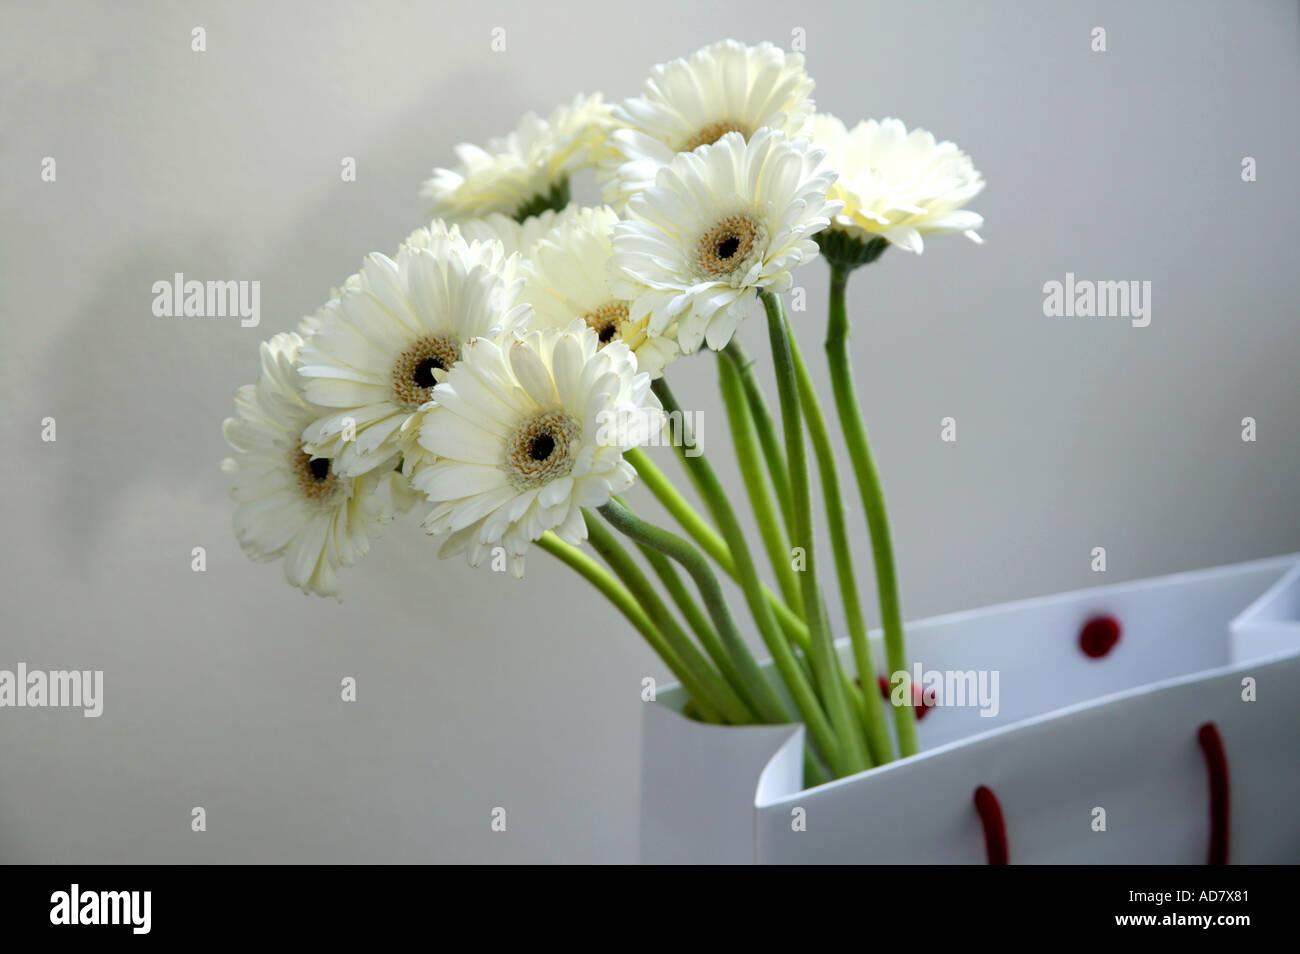 Bunch of white gerbera flowers in carrier bag stock photo 4353664 bunch of white gerbera flowers in carrier bag mightylinksfo